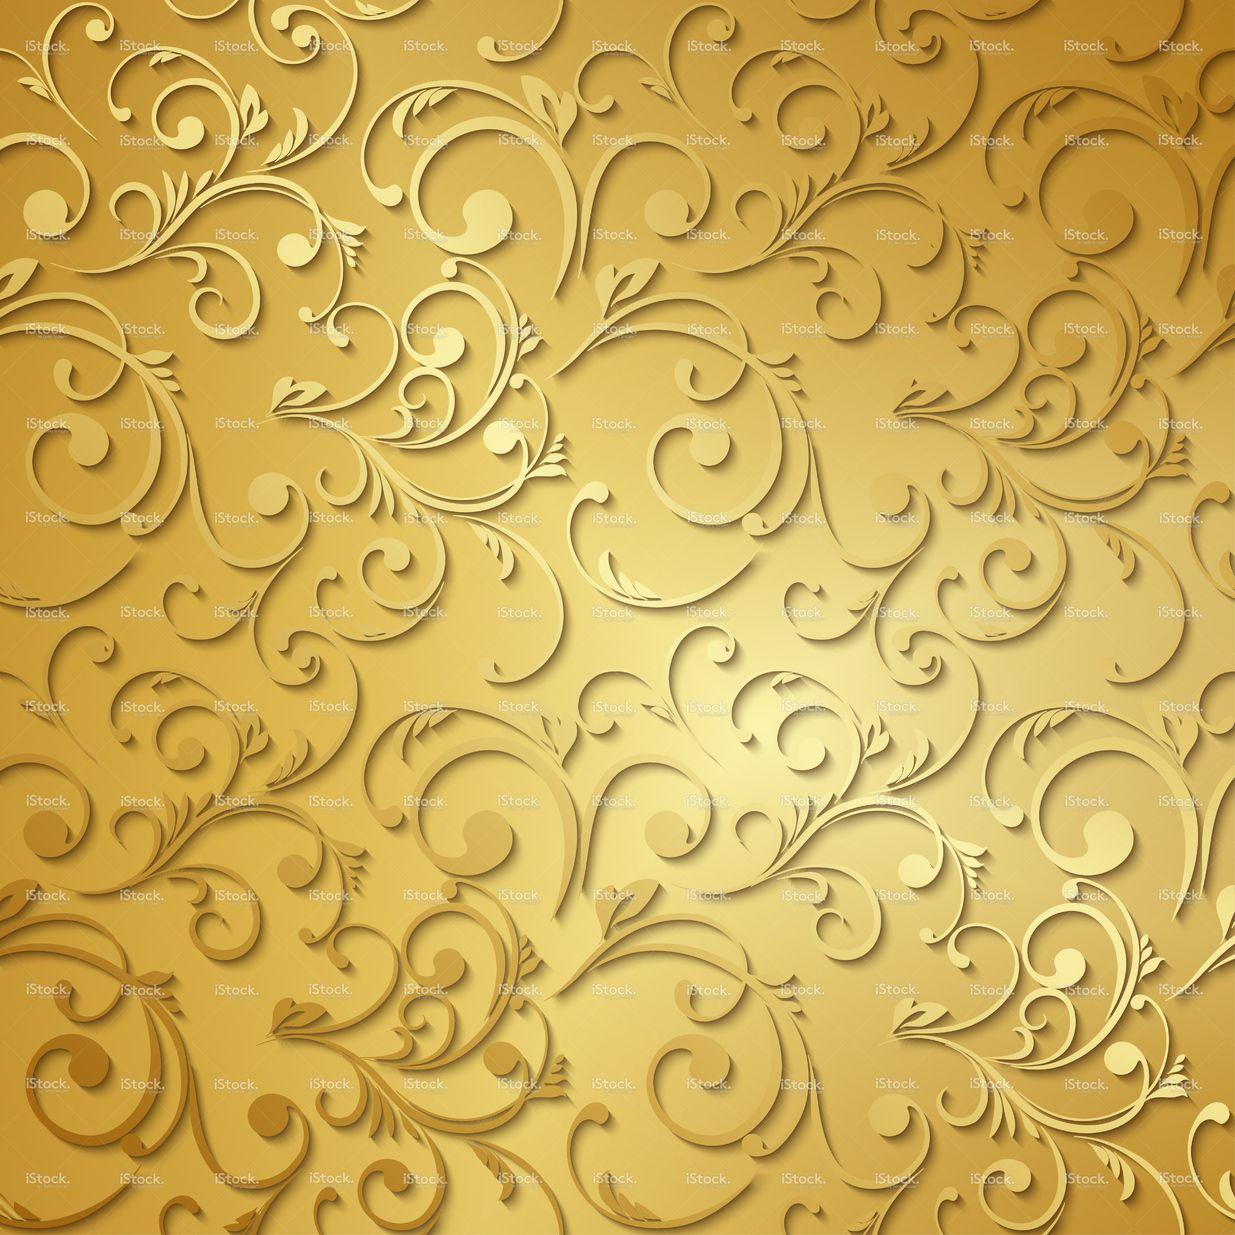 Luxury Golden Wallpaper Vintage Floral Pattern Vector Background Floral Wallpaper Floral Pattern Vector Golden Wallpaper